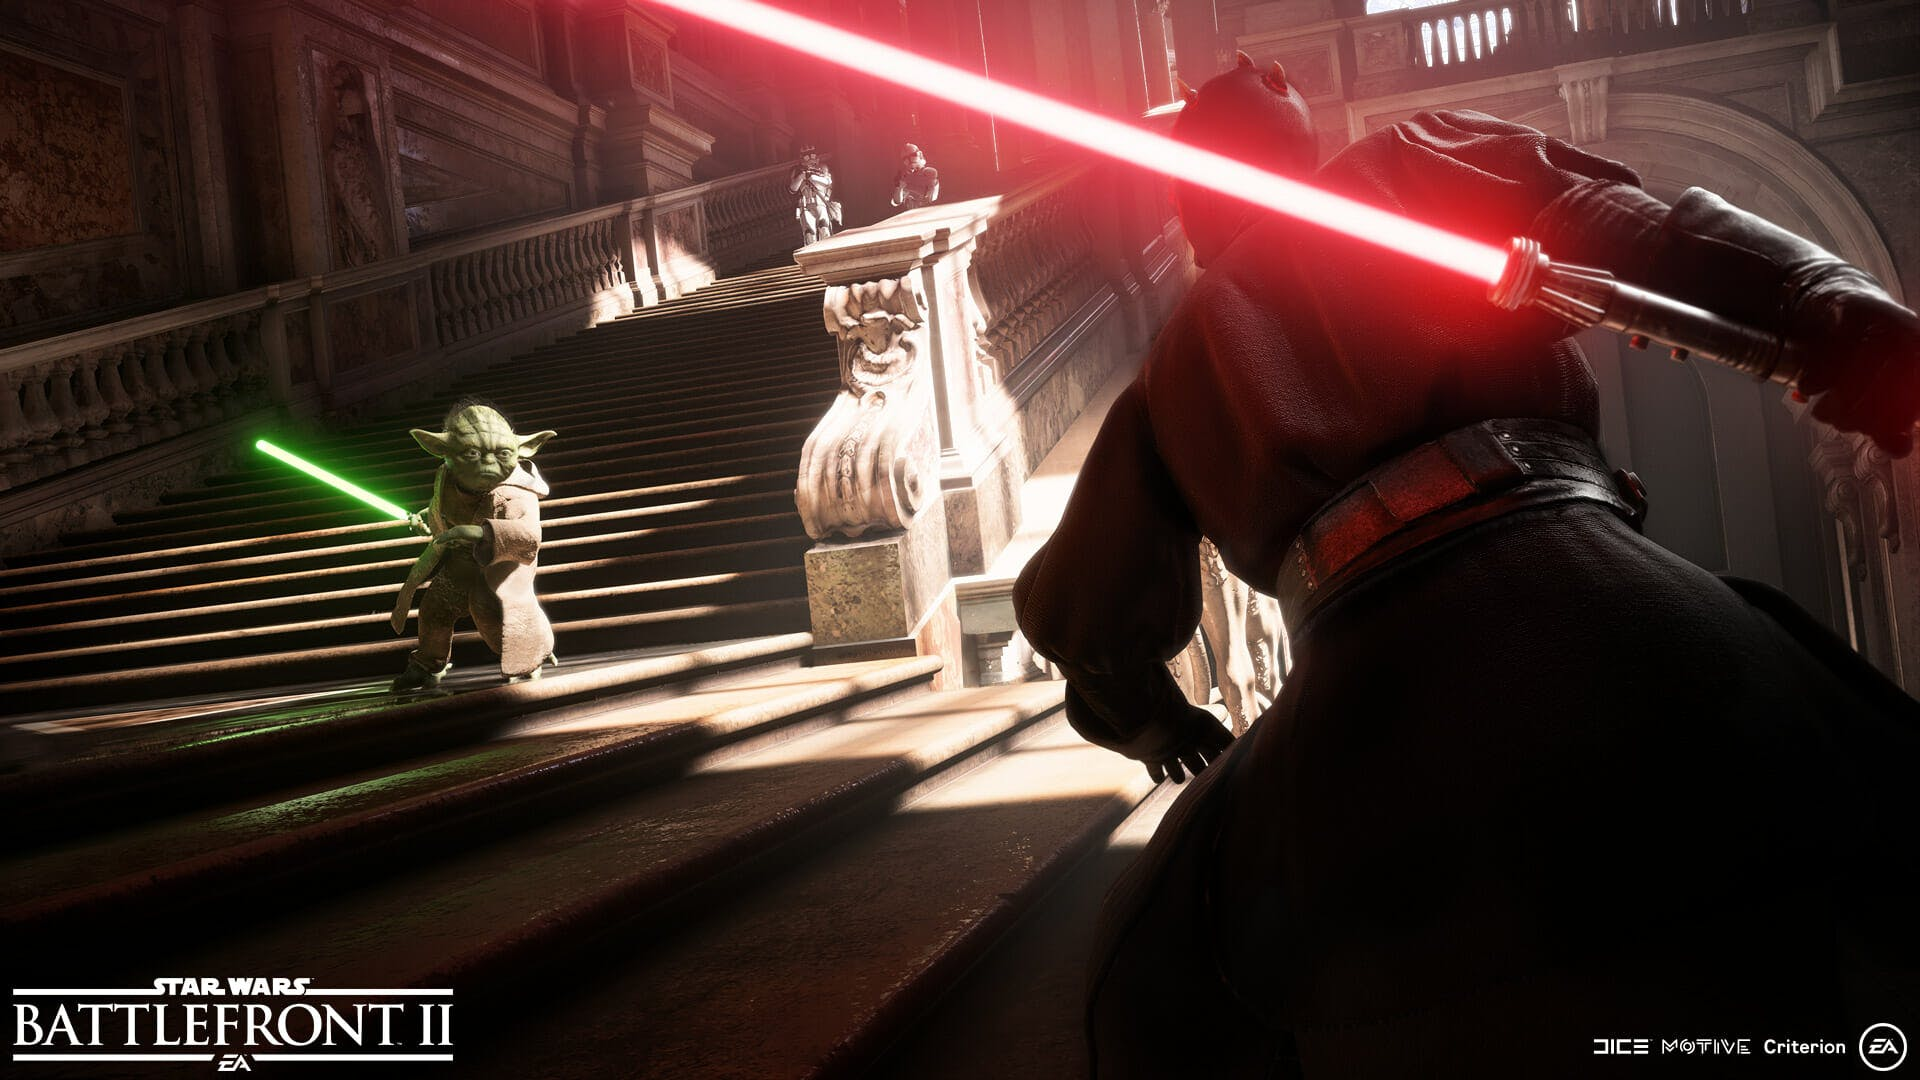 Star Wars Battlefront 2 Xbox One X Enhanced